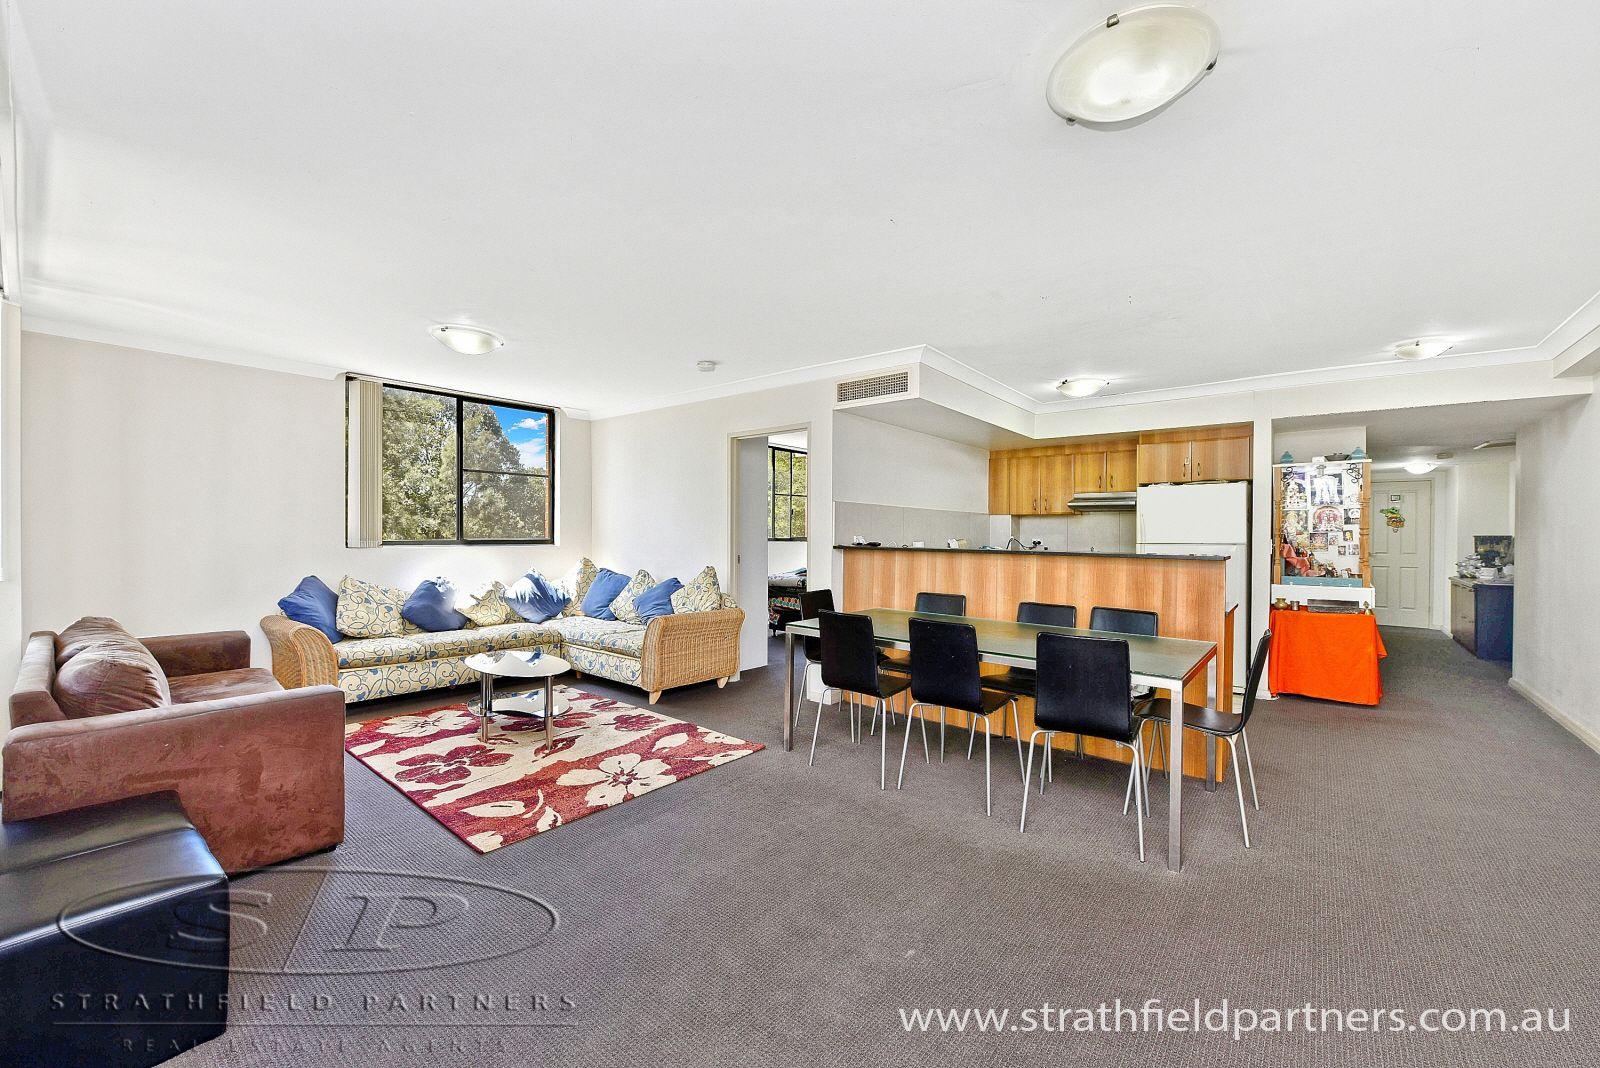 17/1-4 The Crescent, Strathfield NSW 2135, Image 0